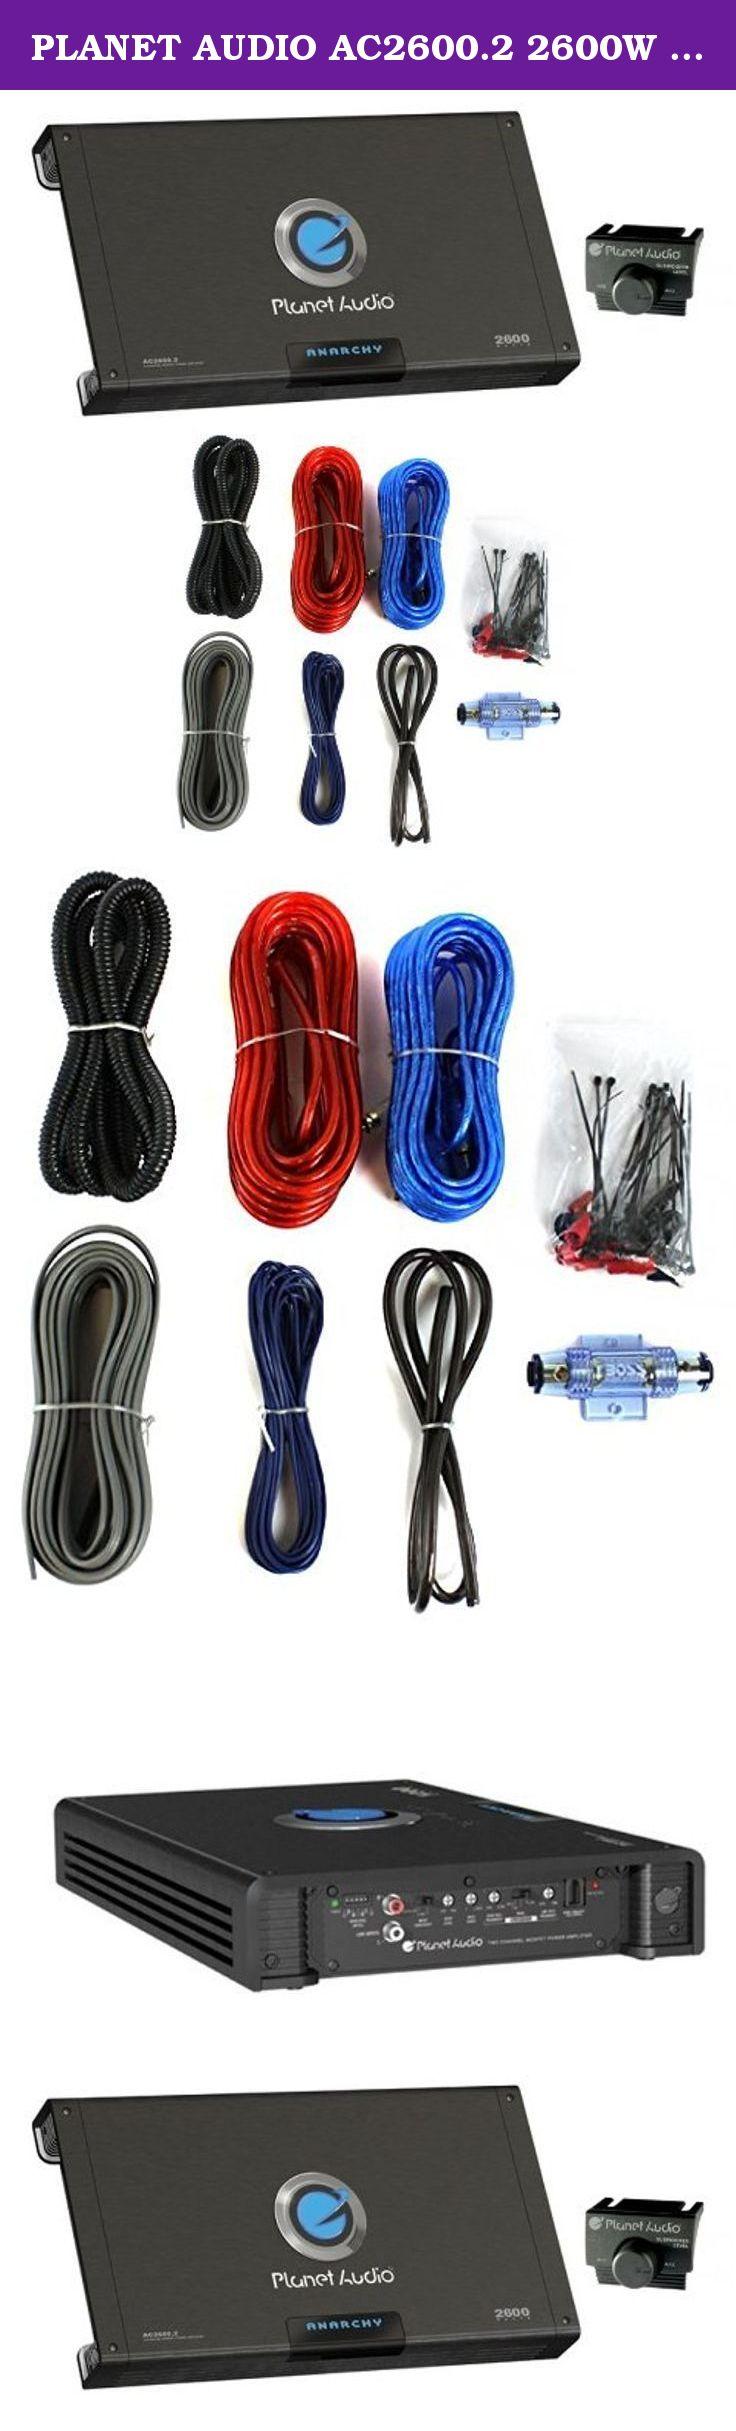 Planet Audio Ac26002 2600w 2 Channel Car Amplifier 8 Wiring Ga